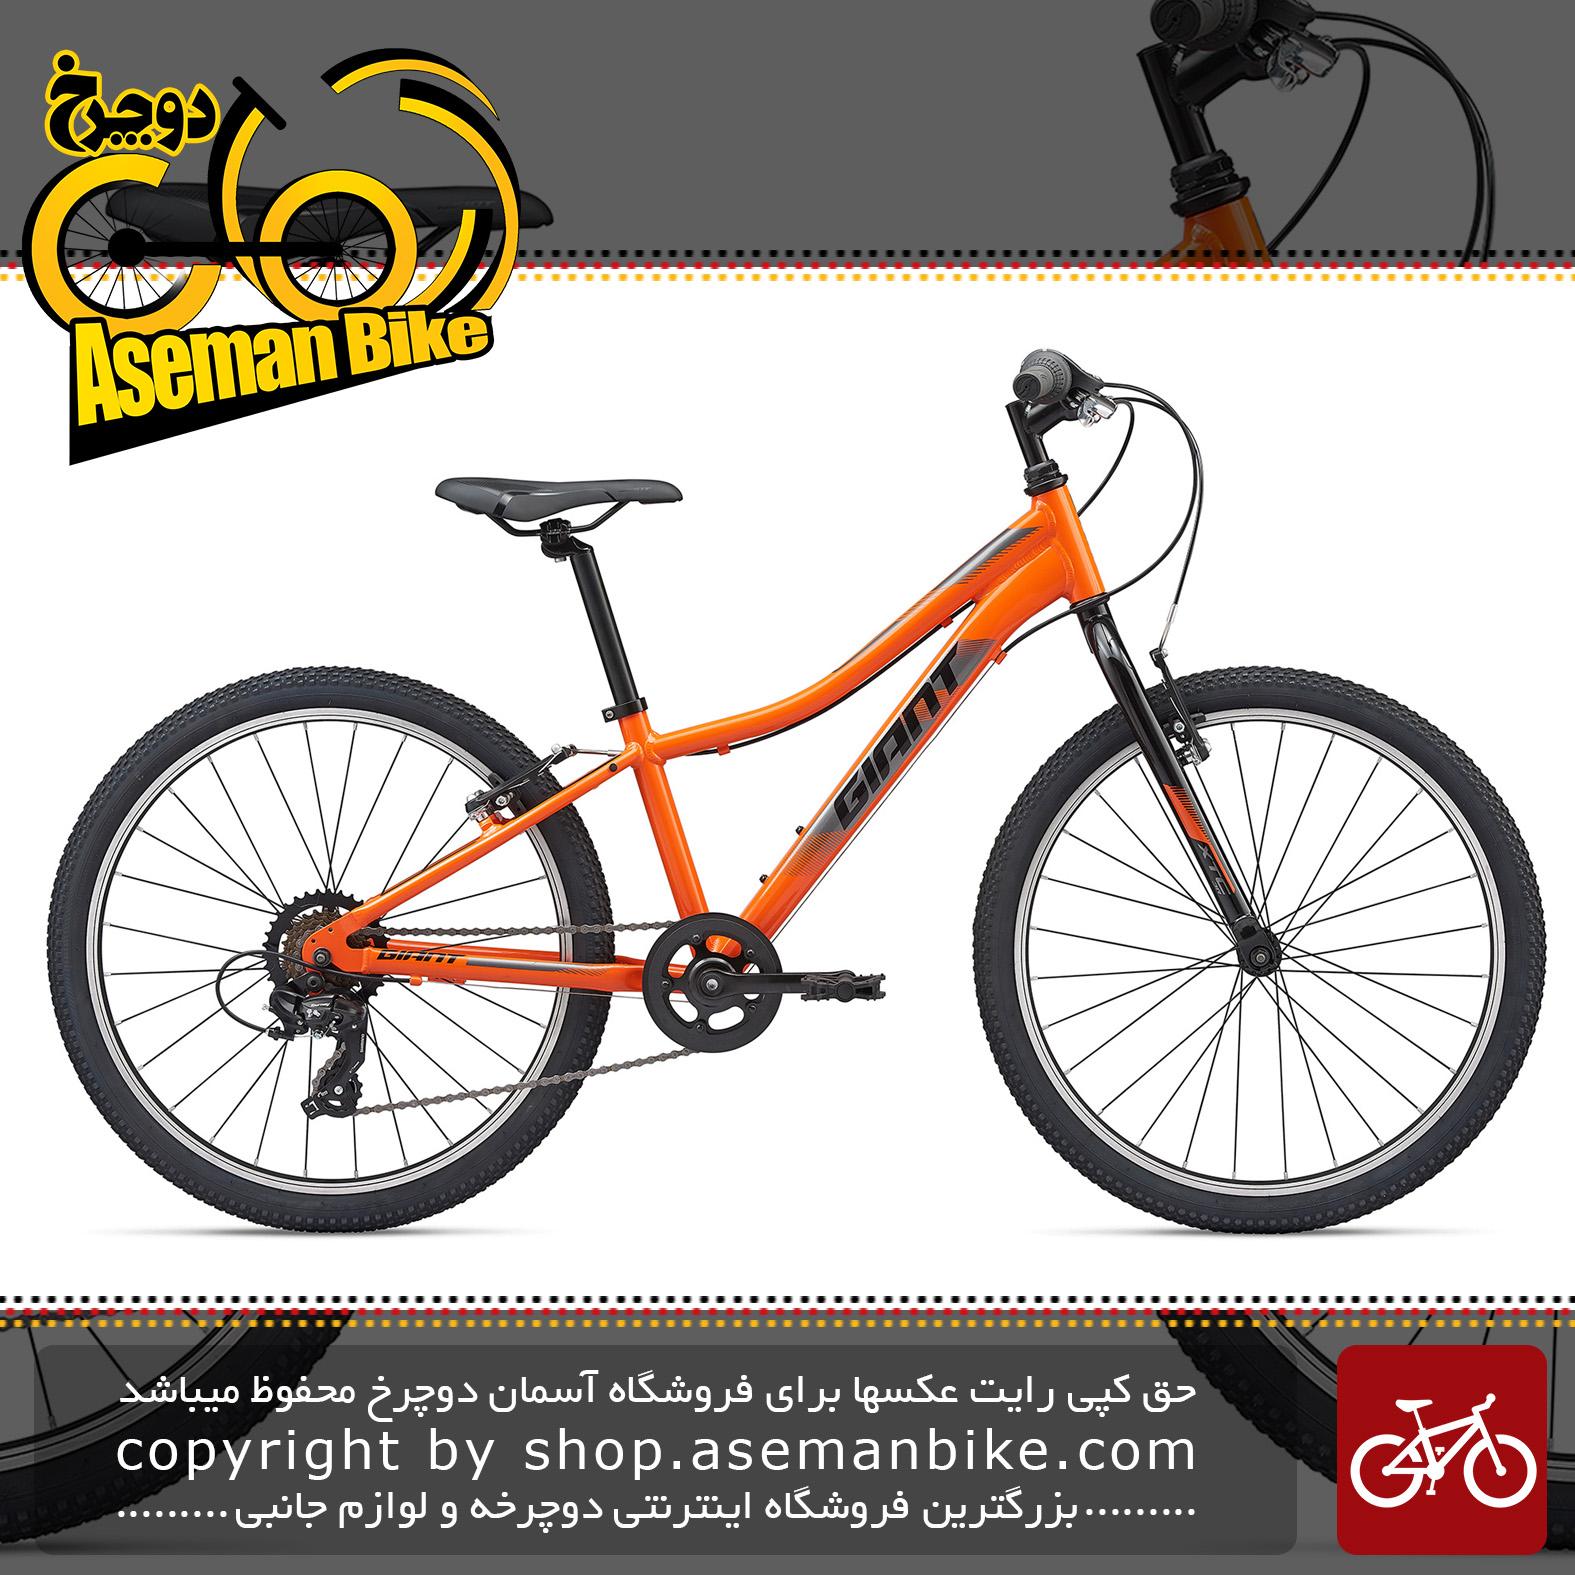 دوچرخه کوهستان جاینت مدل ایکس تی سی جی آر 24 اینچ لیت 2020 Giant Mountain Bicycle XTC Jr 24 Lite 2020